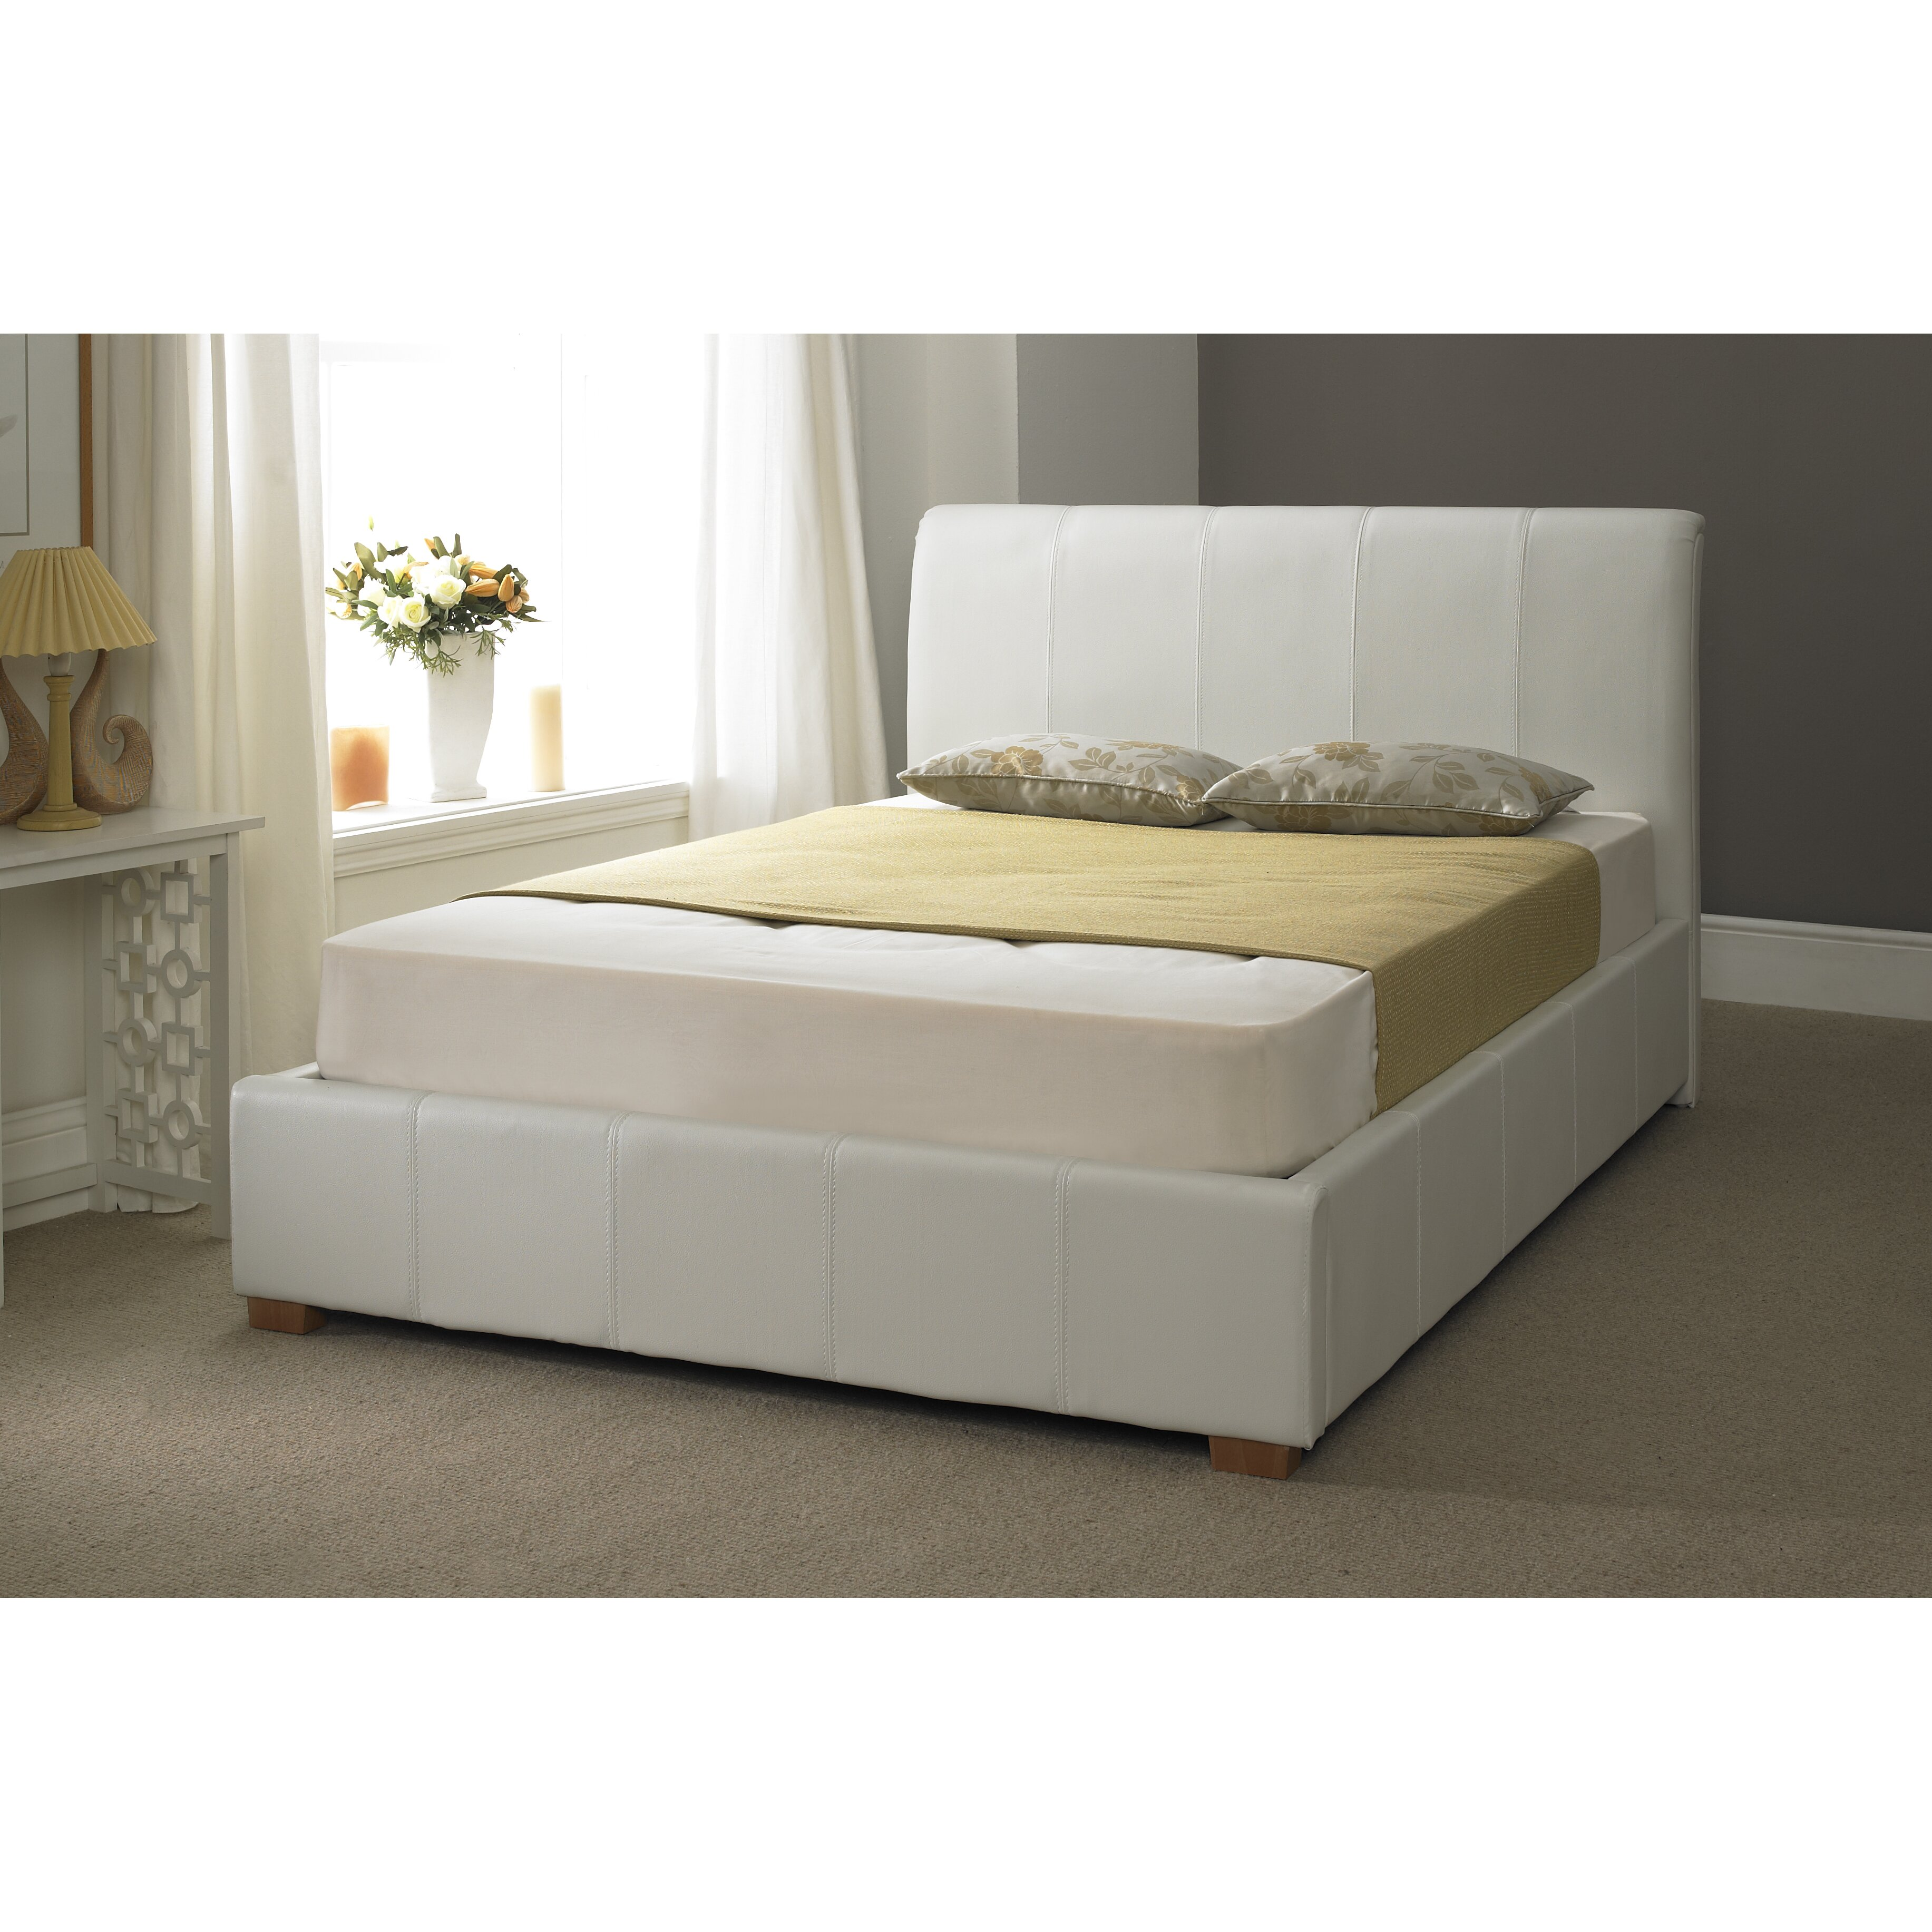 Ottoman Bedroom Home Haus Ryan Upholstered Ottoman Bed Frame Reviews Wayfair